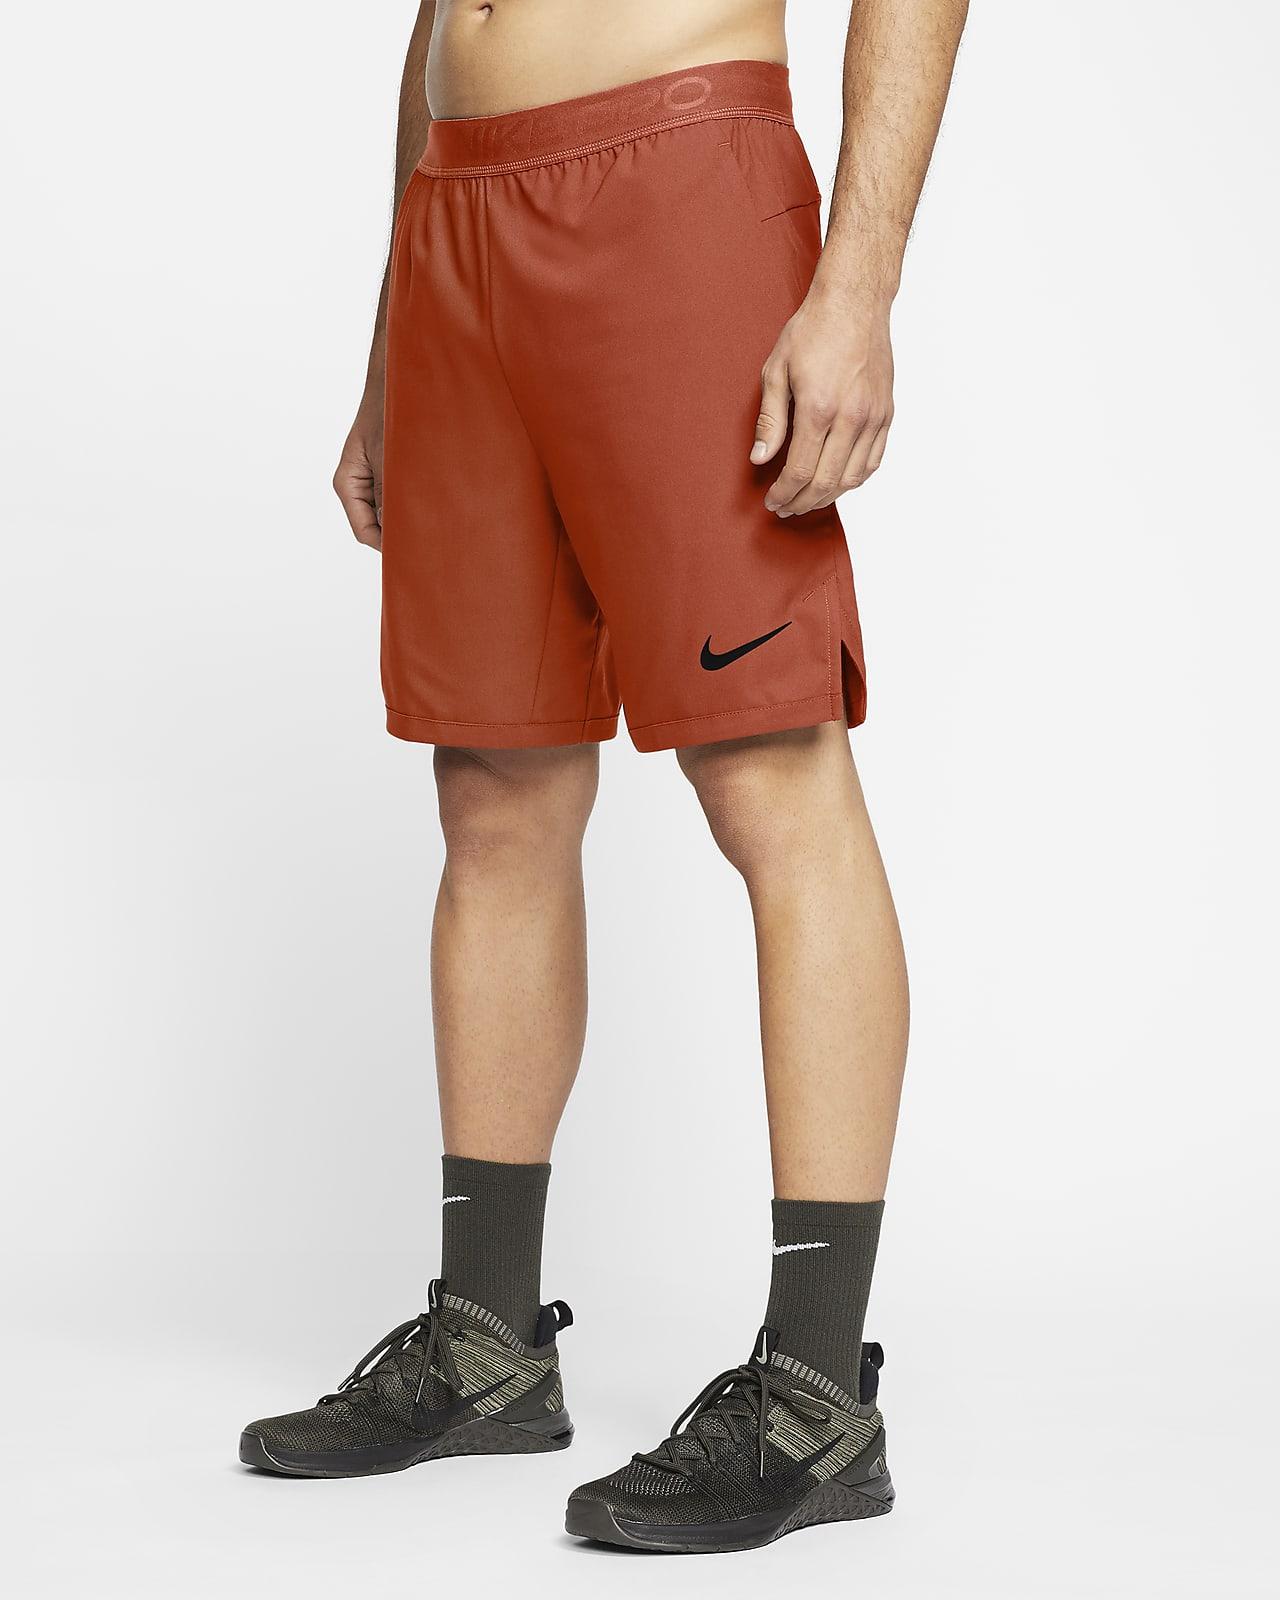 Nike Pro Flex Vent Max Pantalons curts - Home